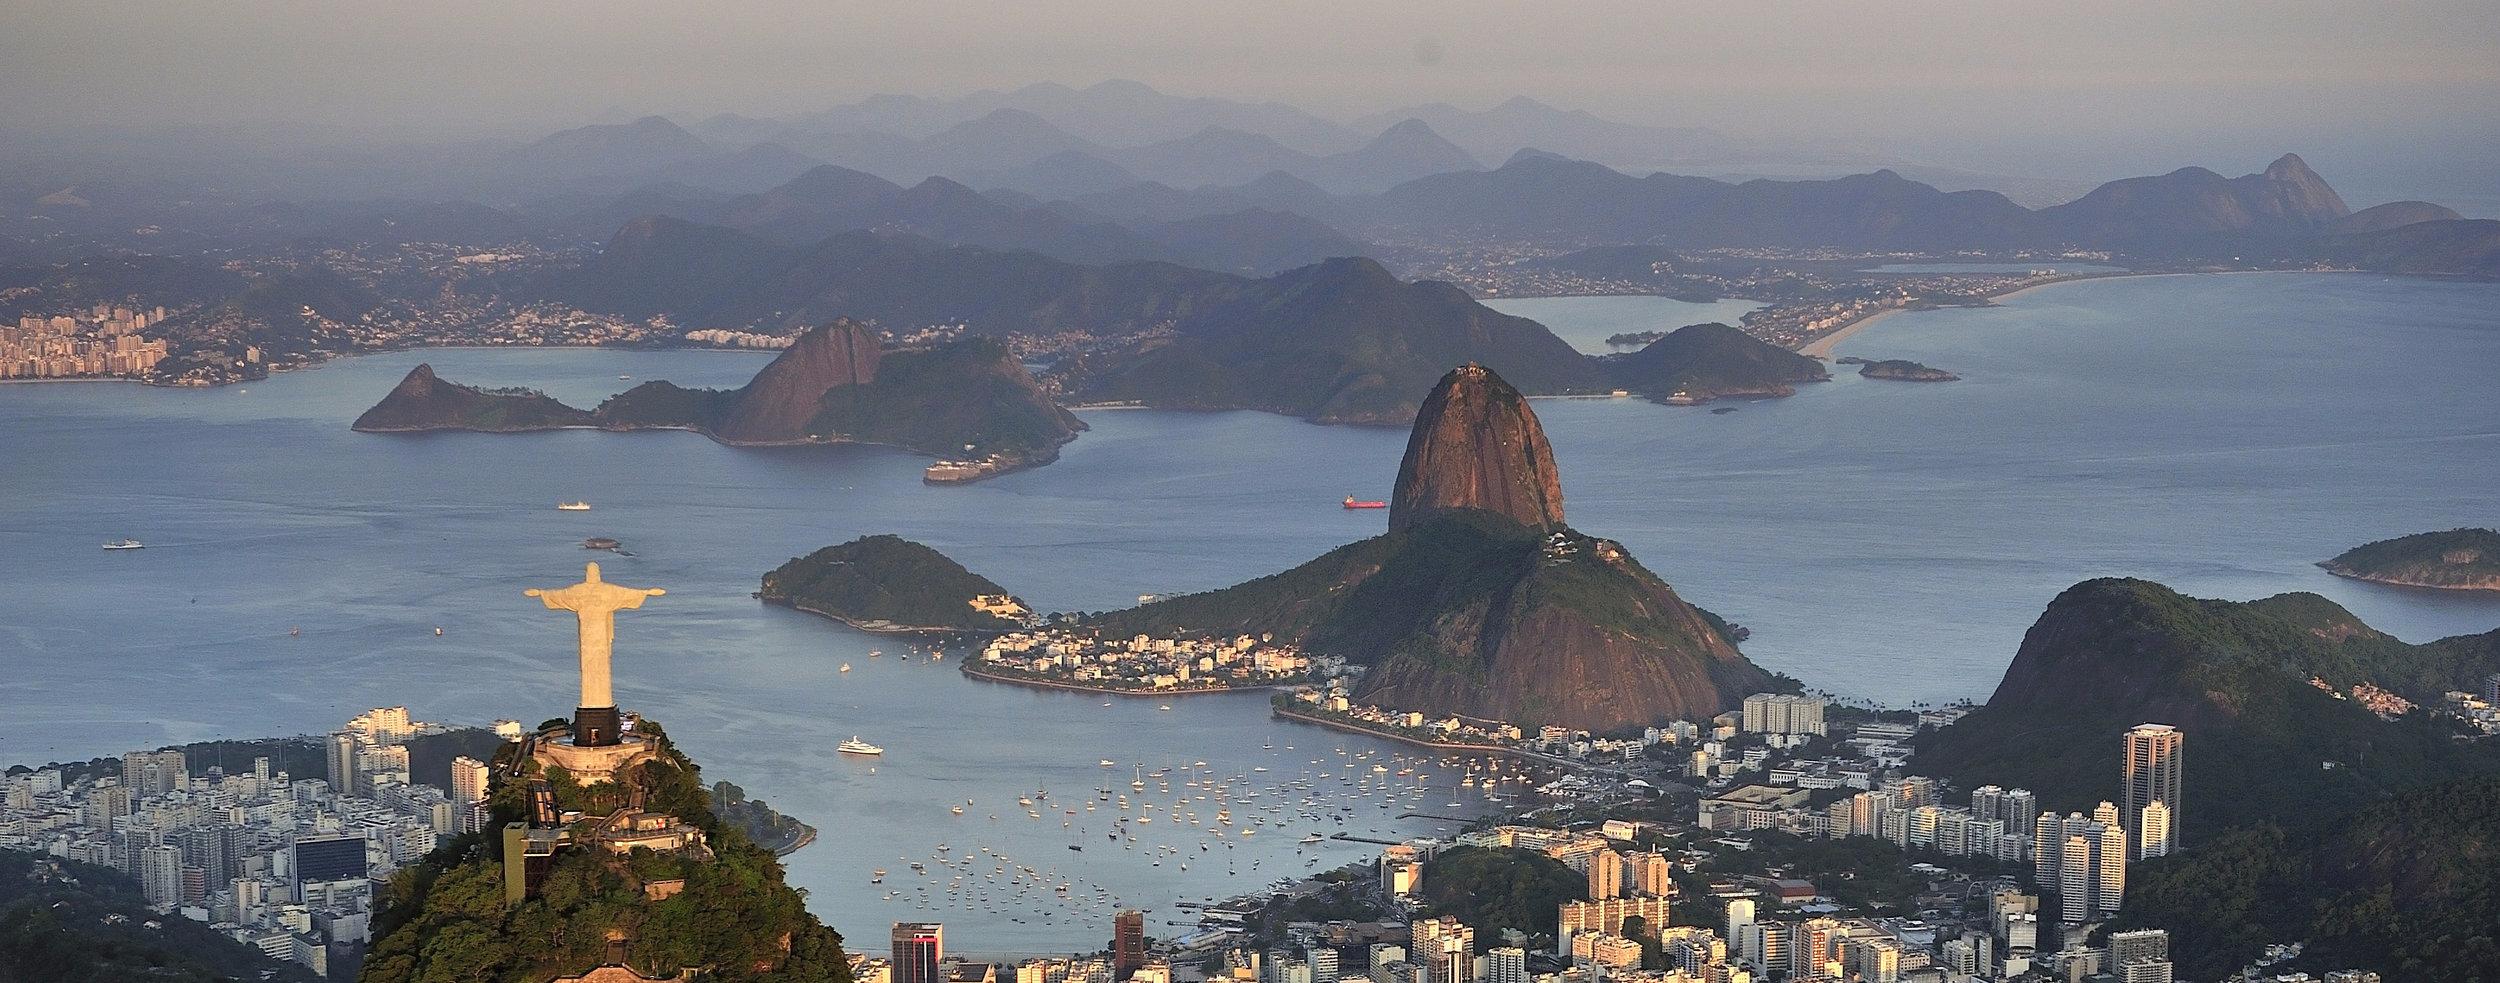 brazil-e1487615399755.jpg